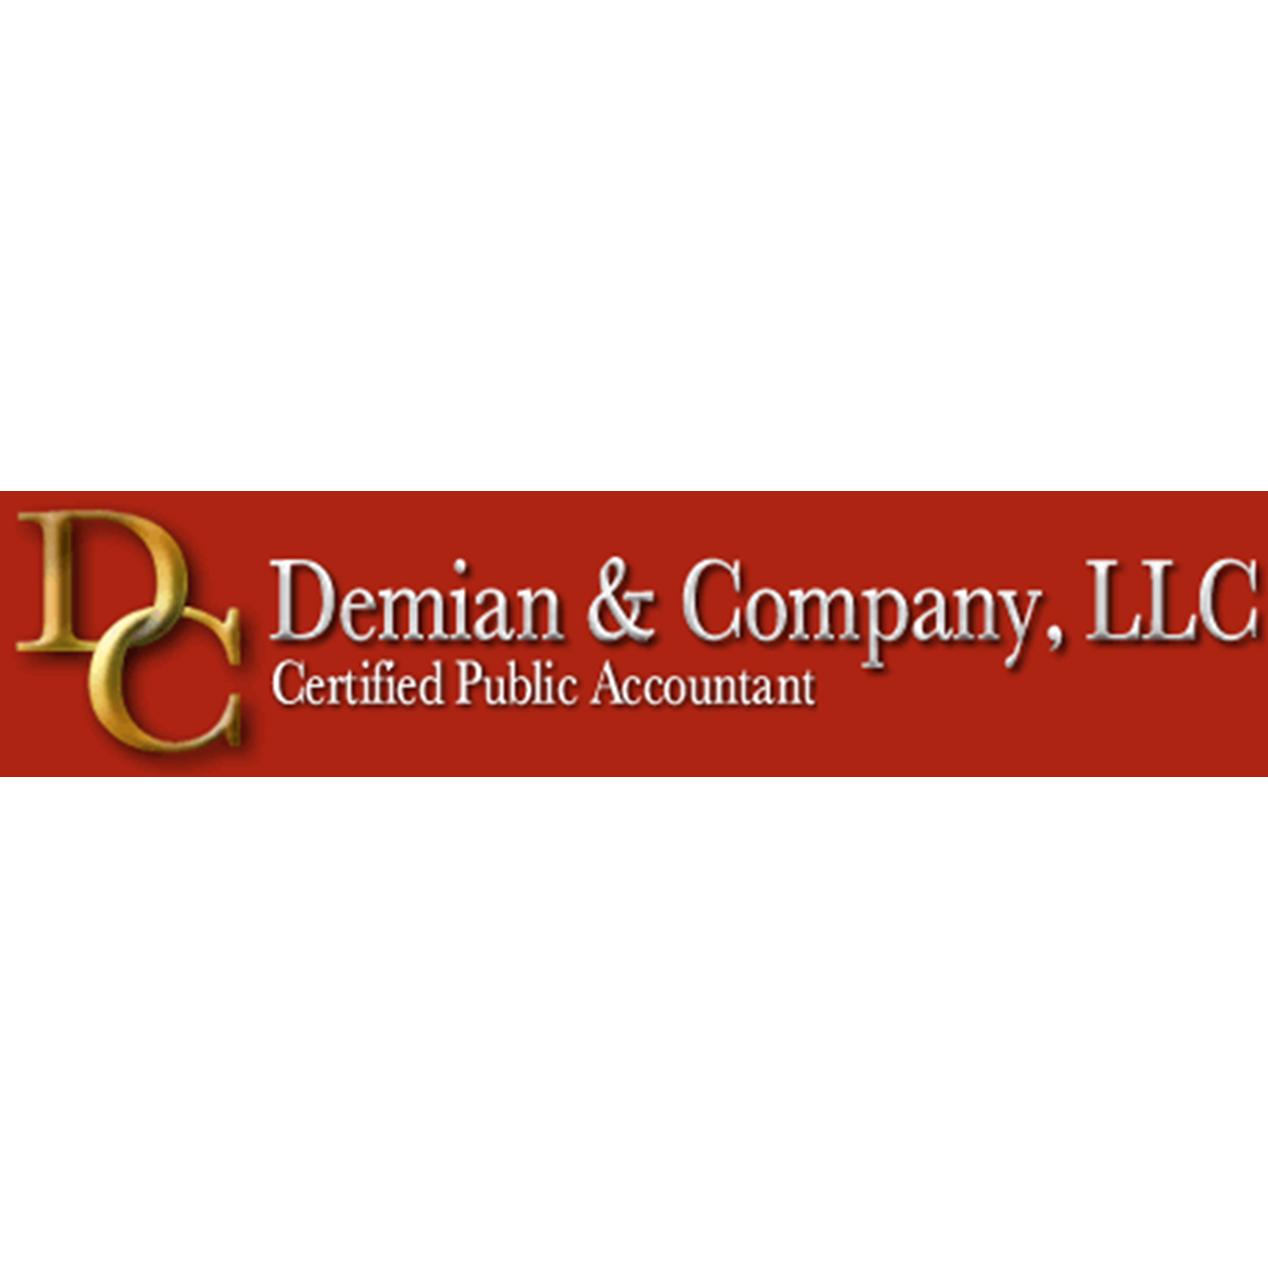 Demian & Company, LLC image 3